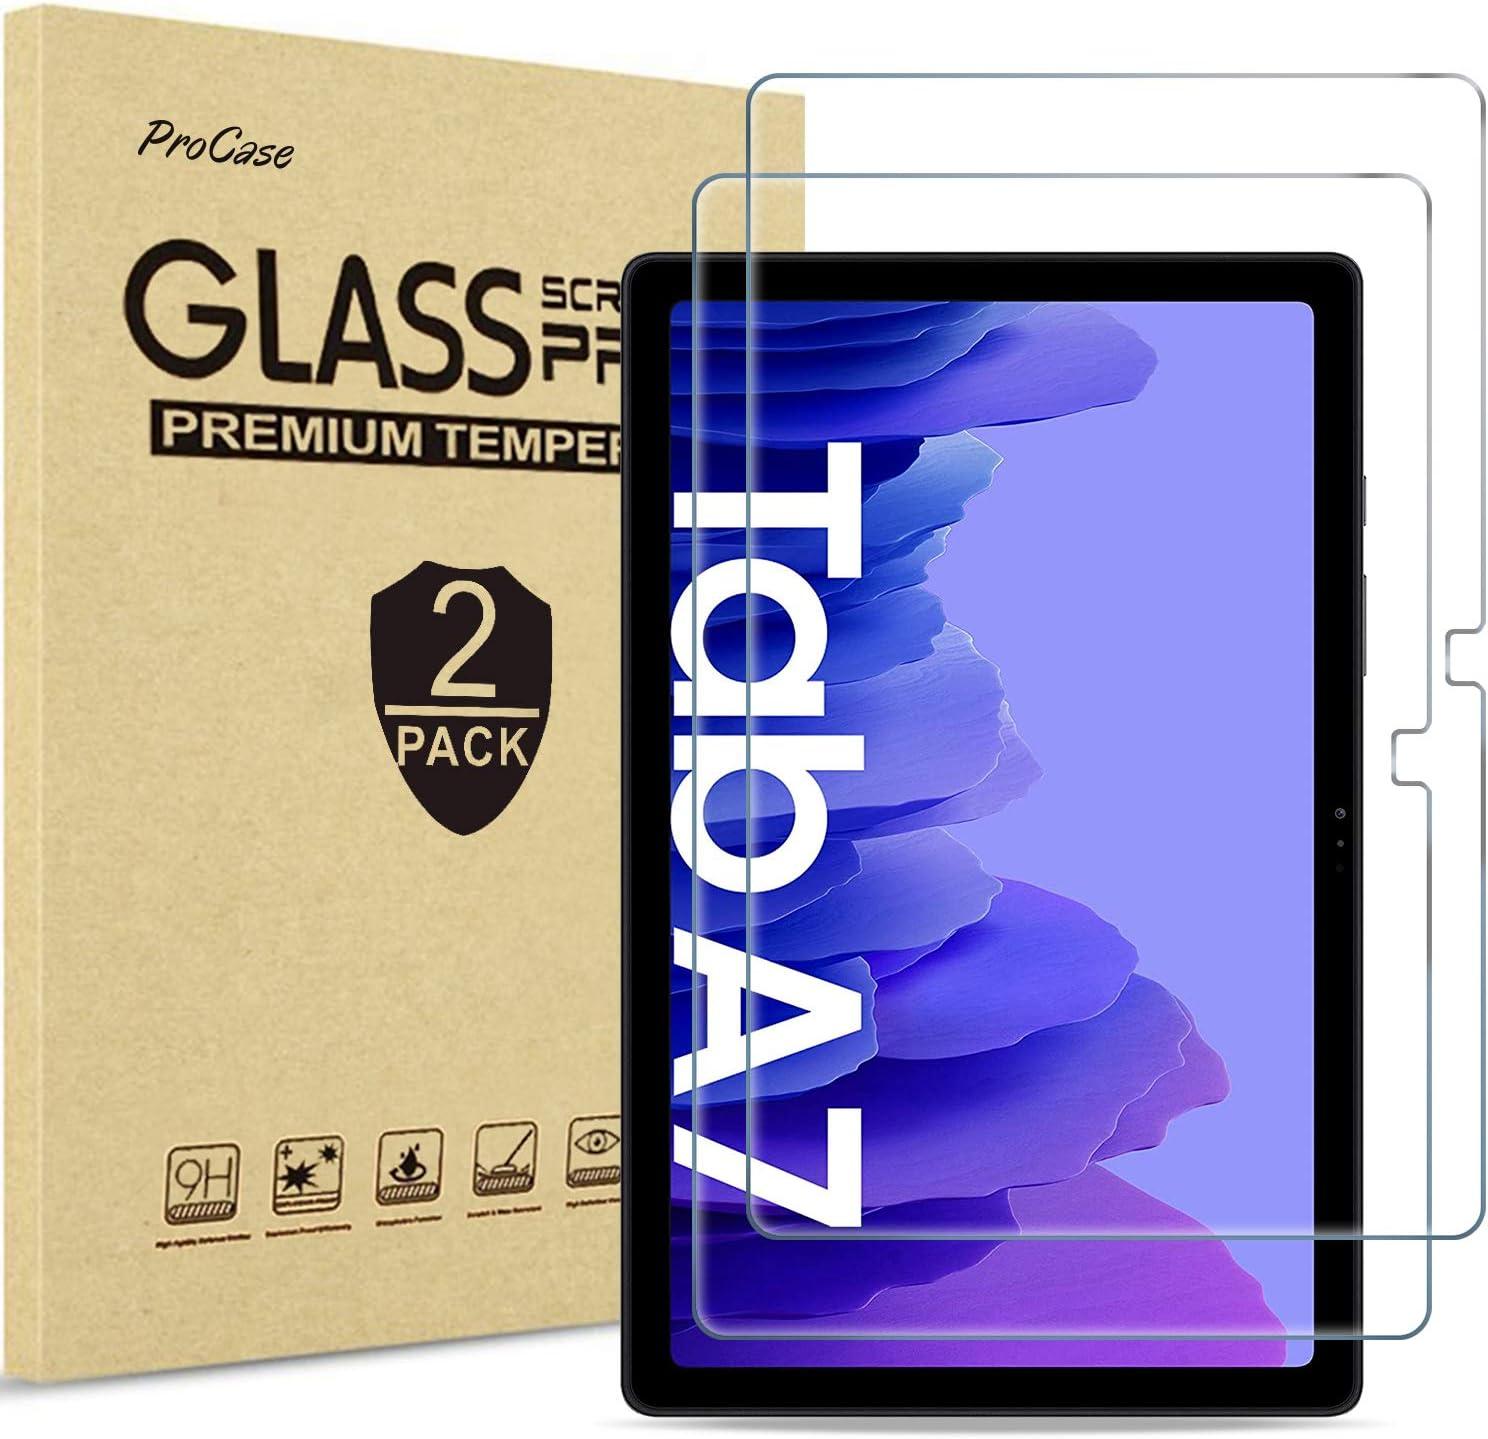 "ProCase 2 Pcs, Protector de Pantalla para Galaxy Tab A7 10.4"" 2020 Model SM-T500 T505 T507, Screen Protector Vidrio Templado Anti-Huellas, Película Protectora para 10.4 Pulgadas Galaxy Tab A7"